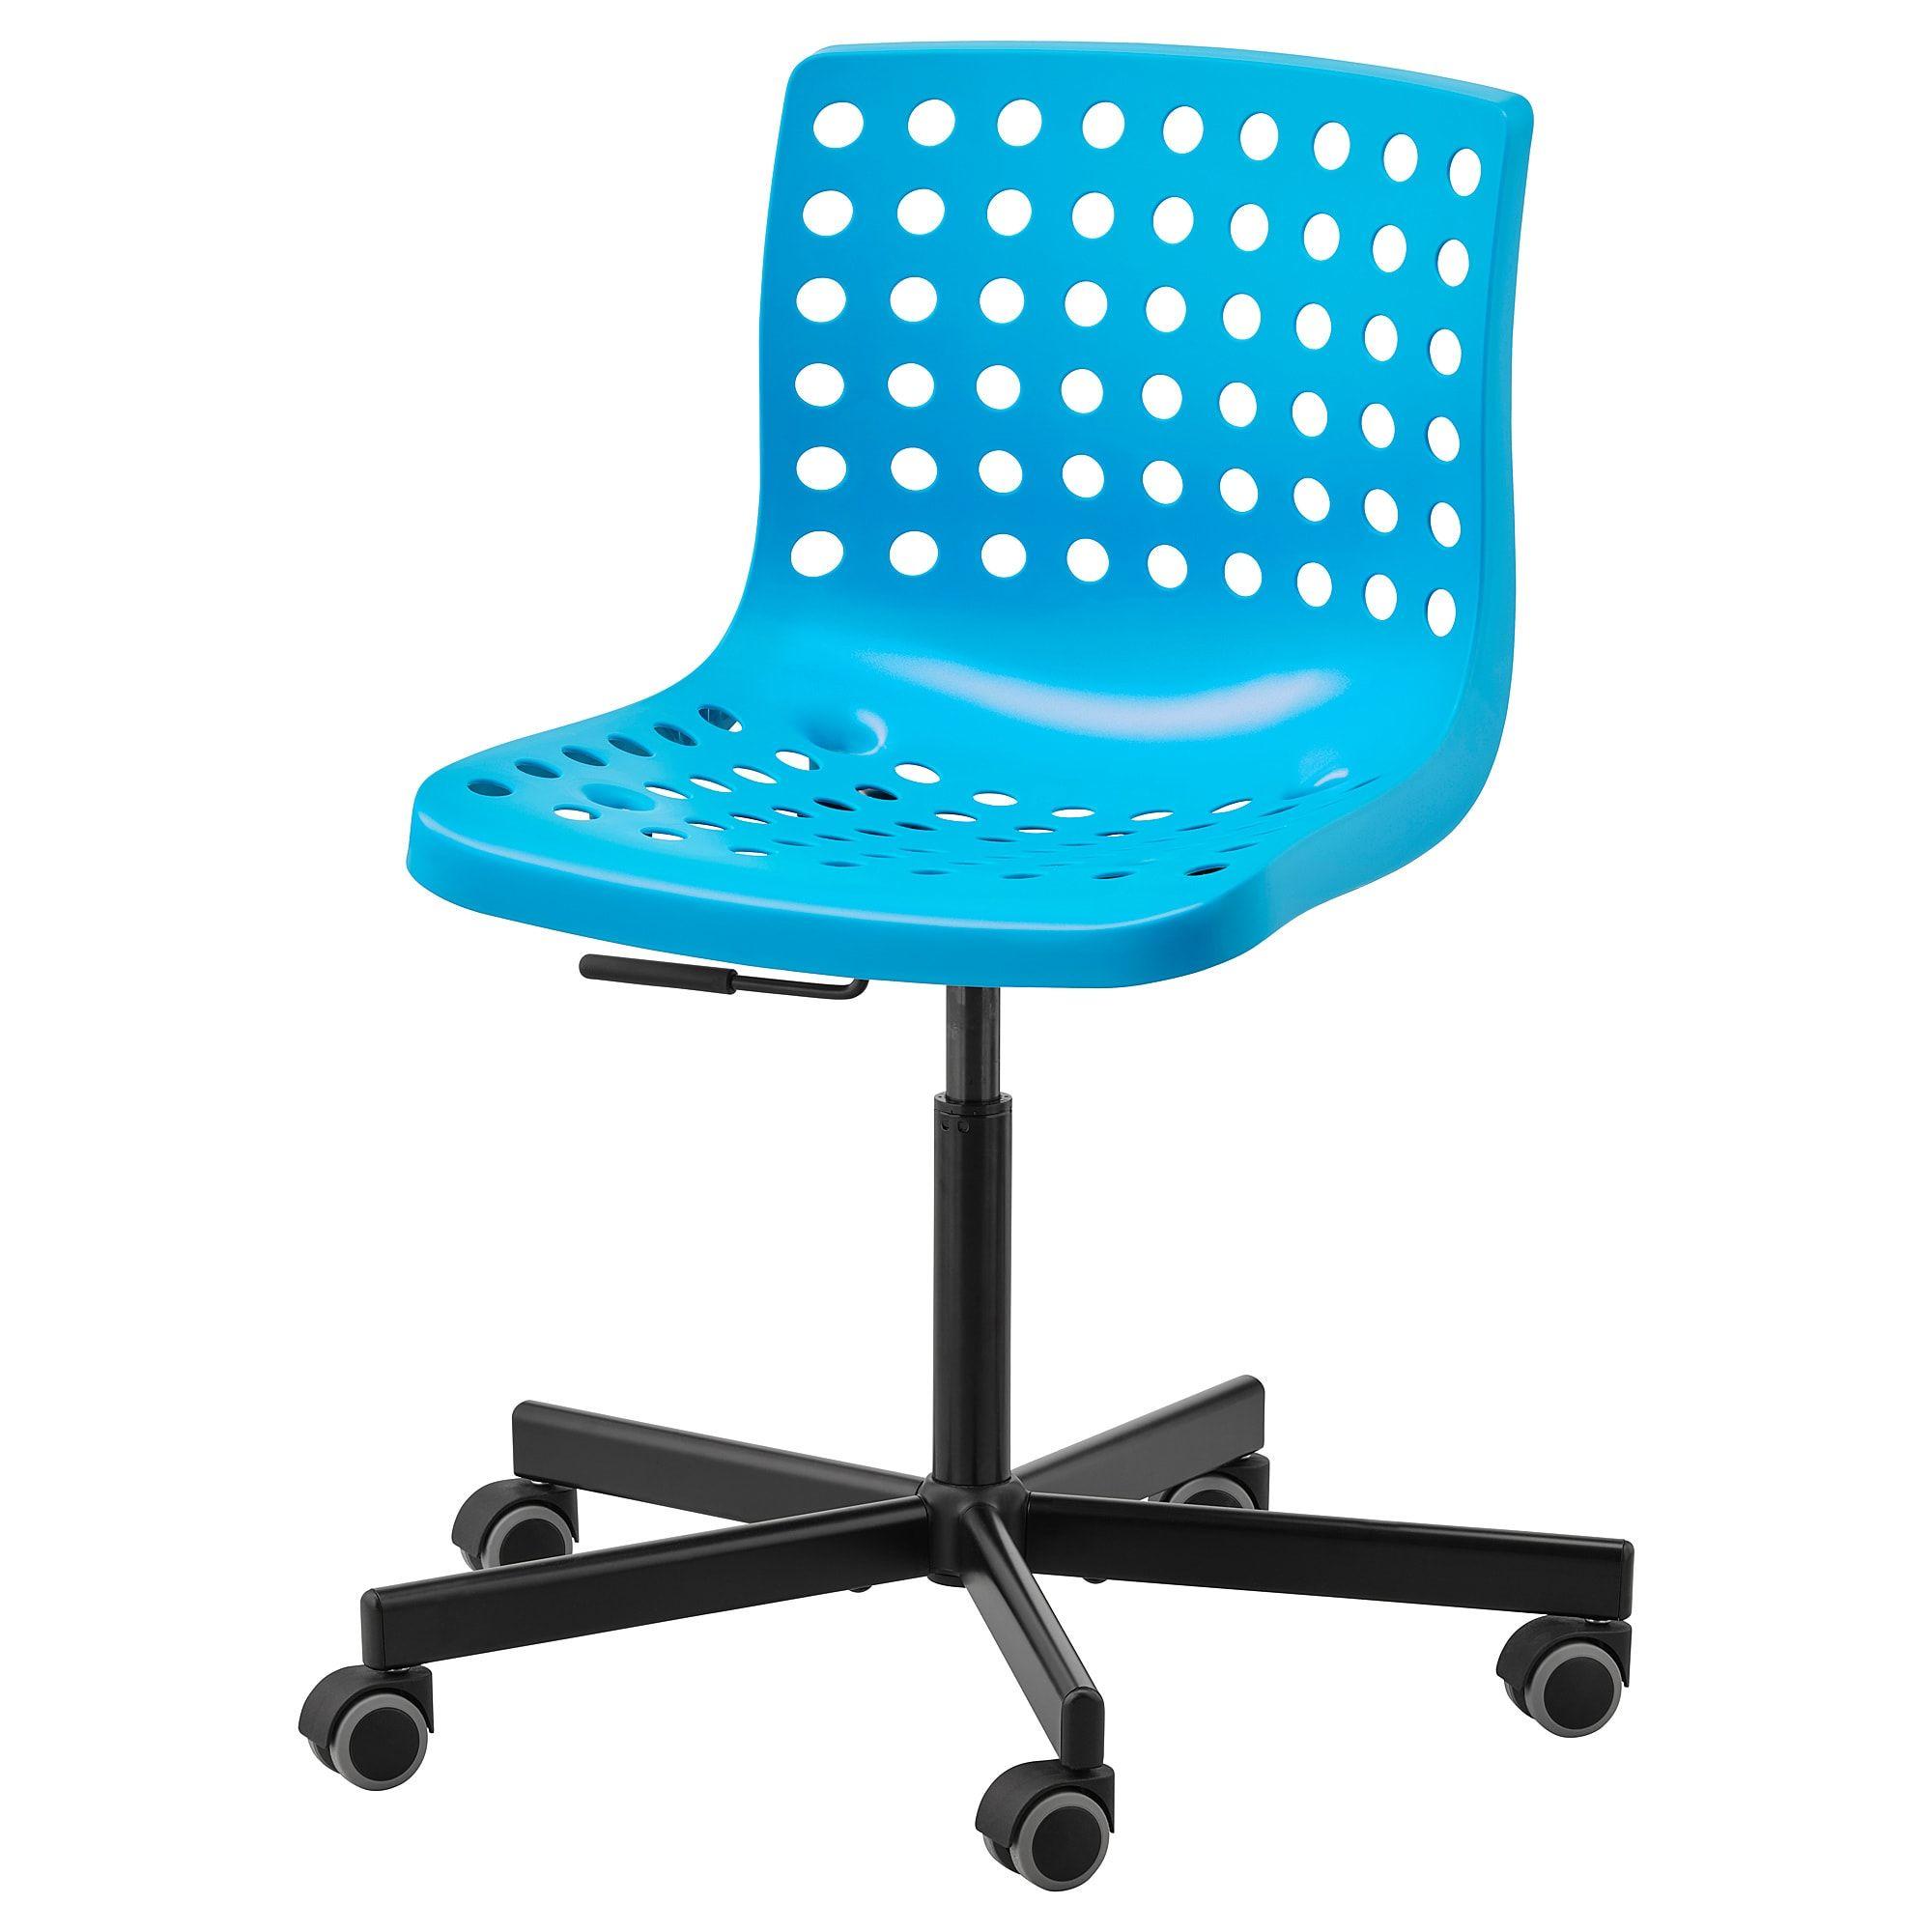 Pin on Purple chairs decor